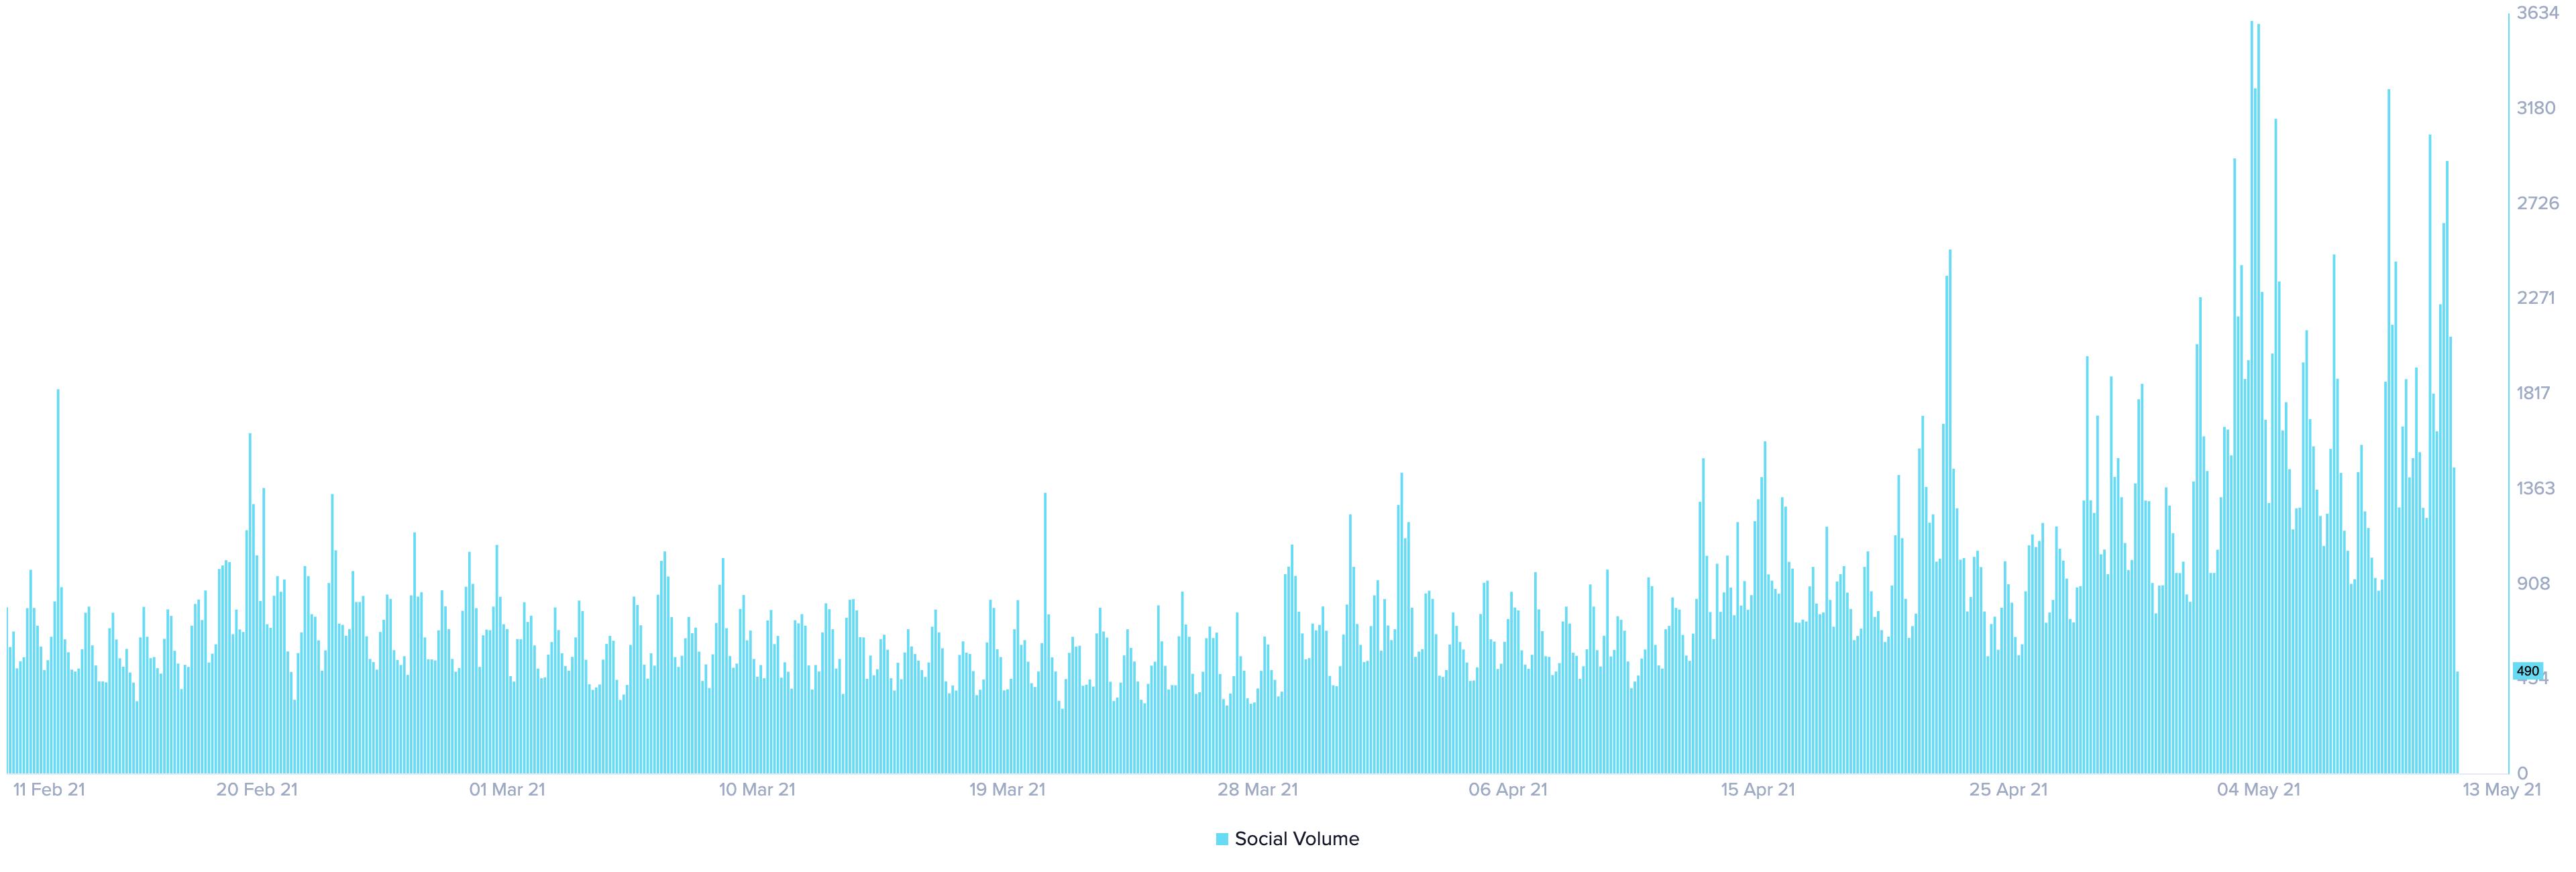 Ethereum social volume